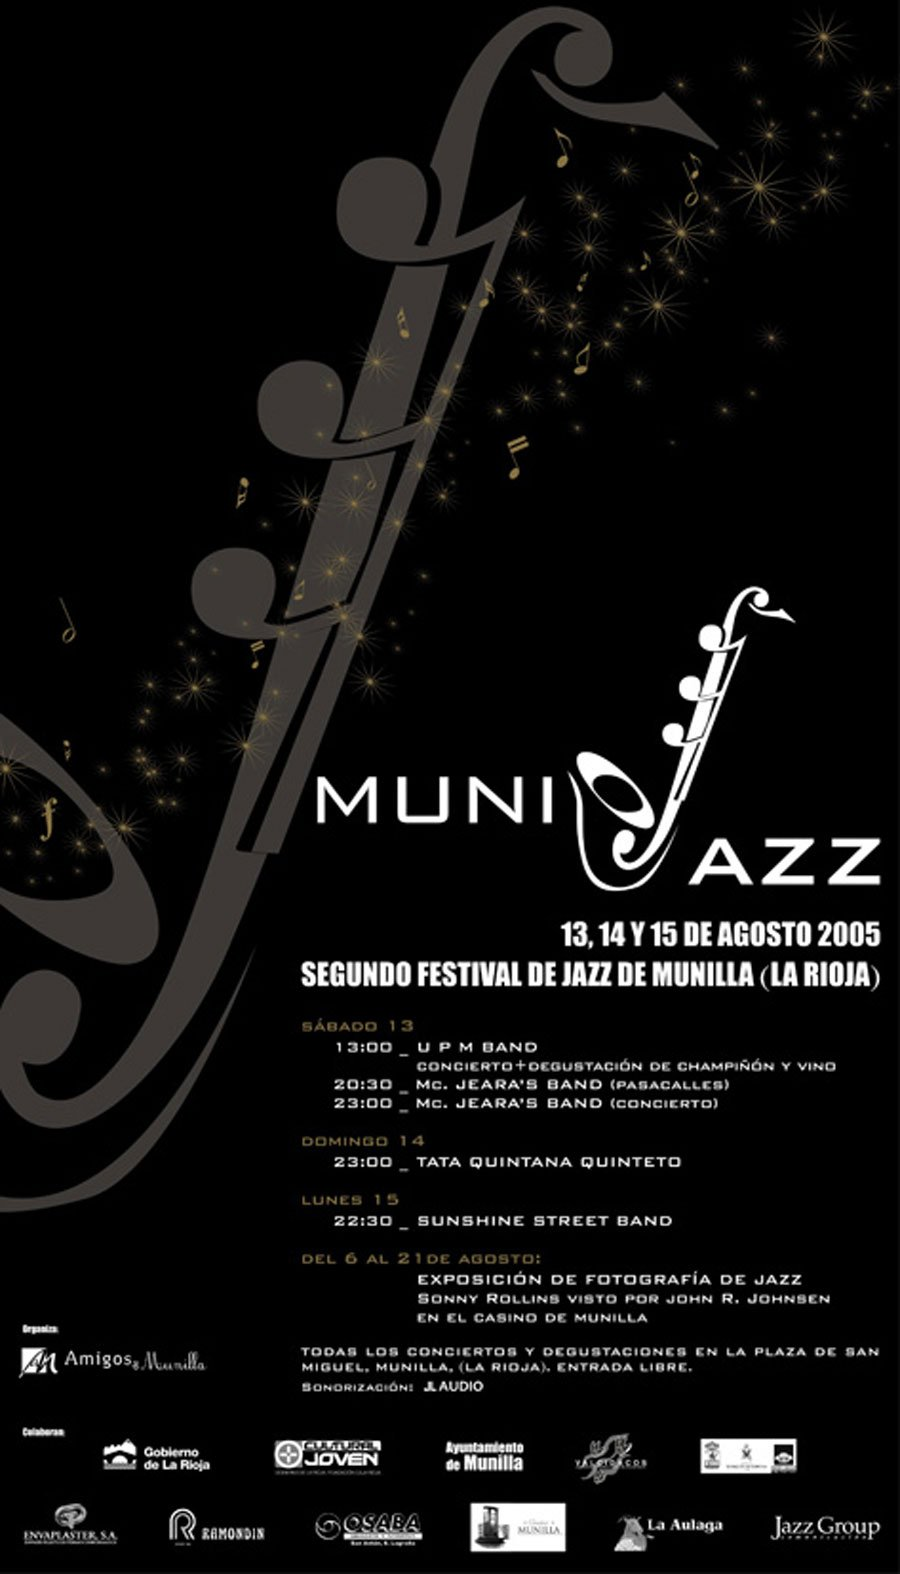 Cartel Munijazz 2005